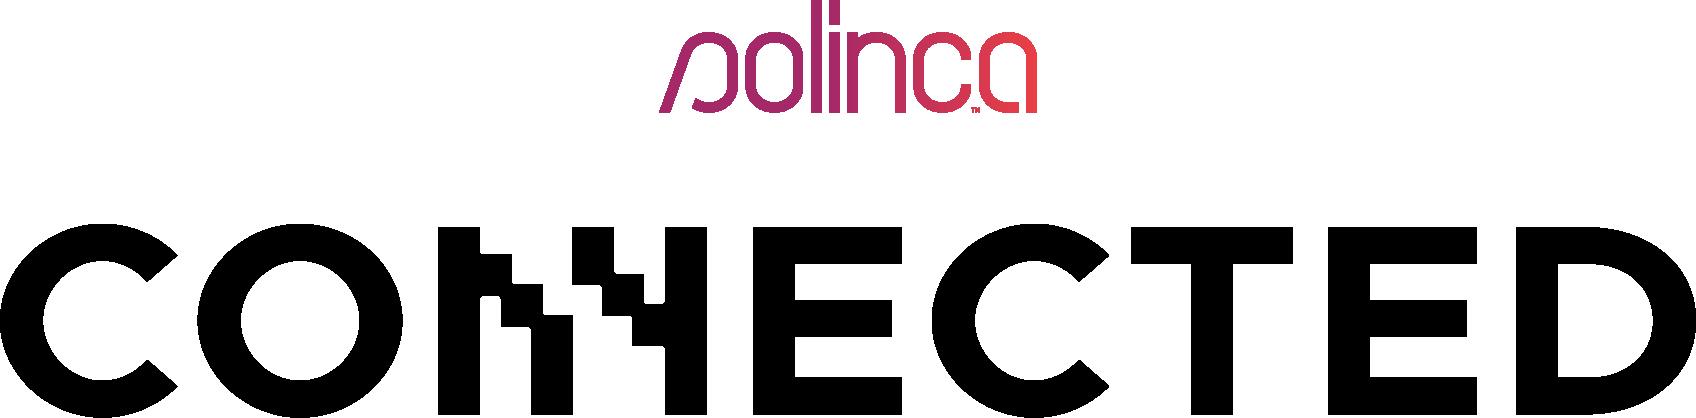 Solinca_Connected_Main_Color_RGB